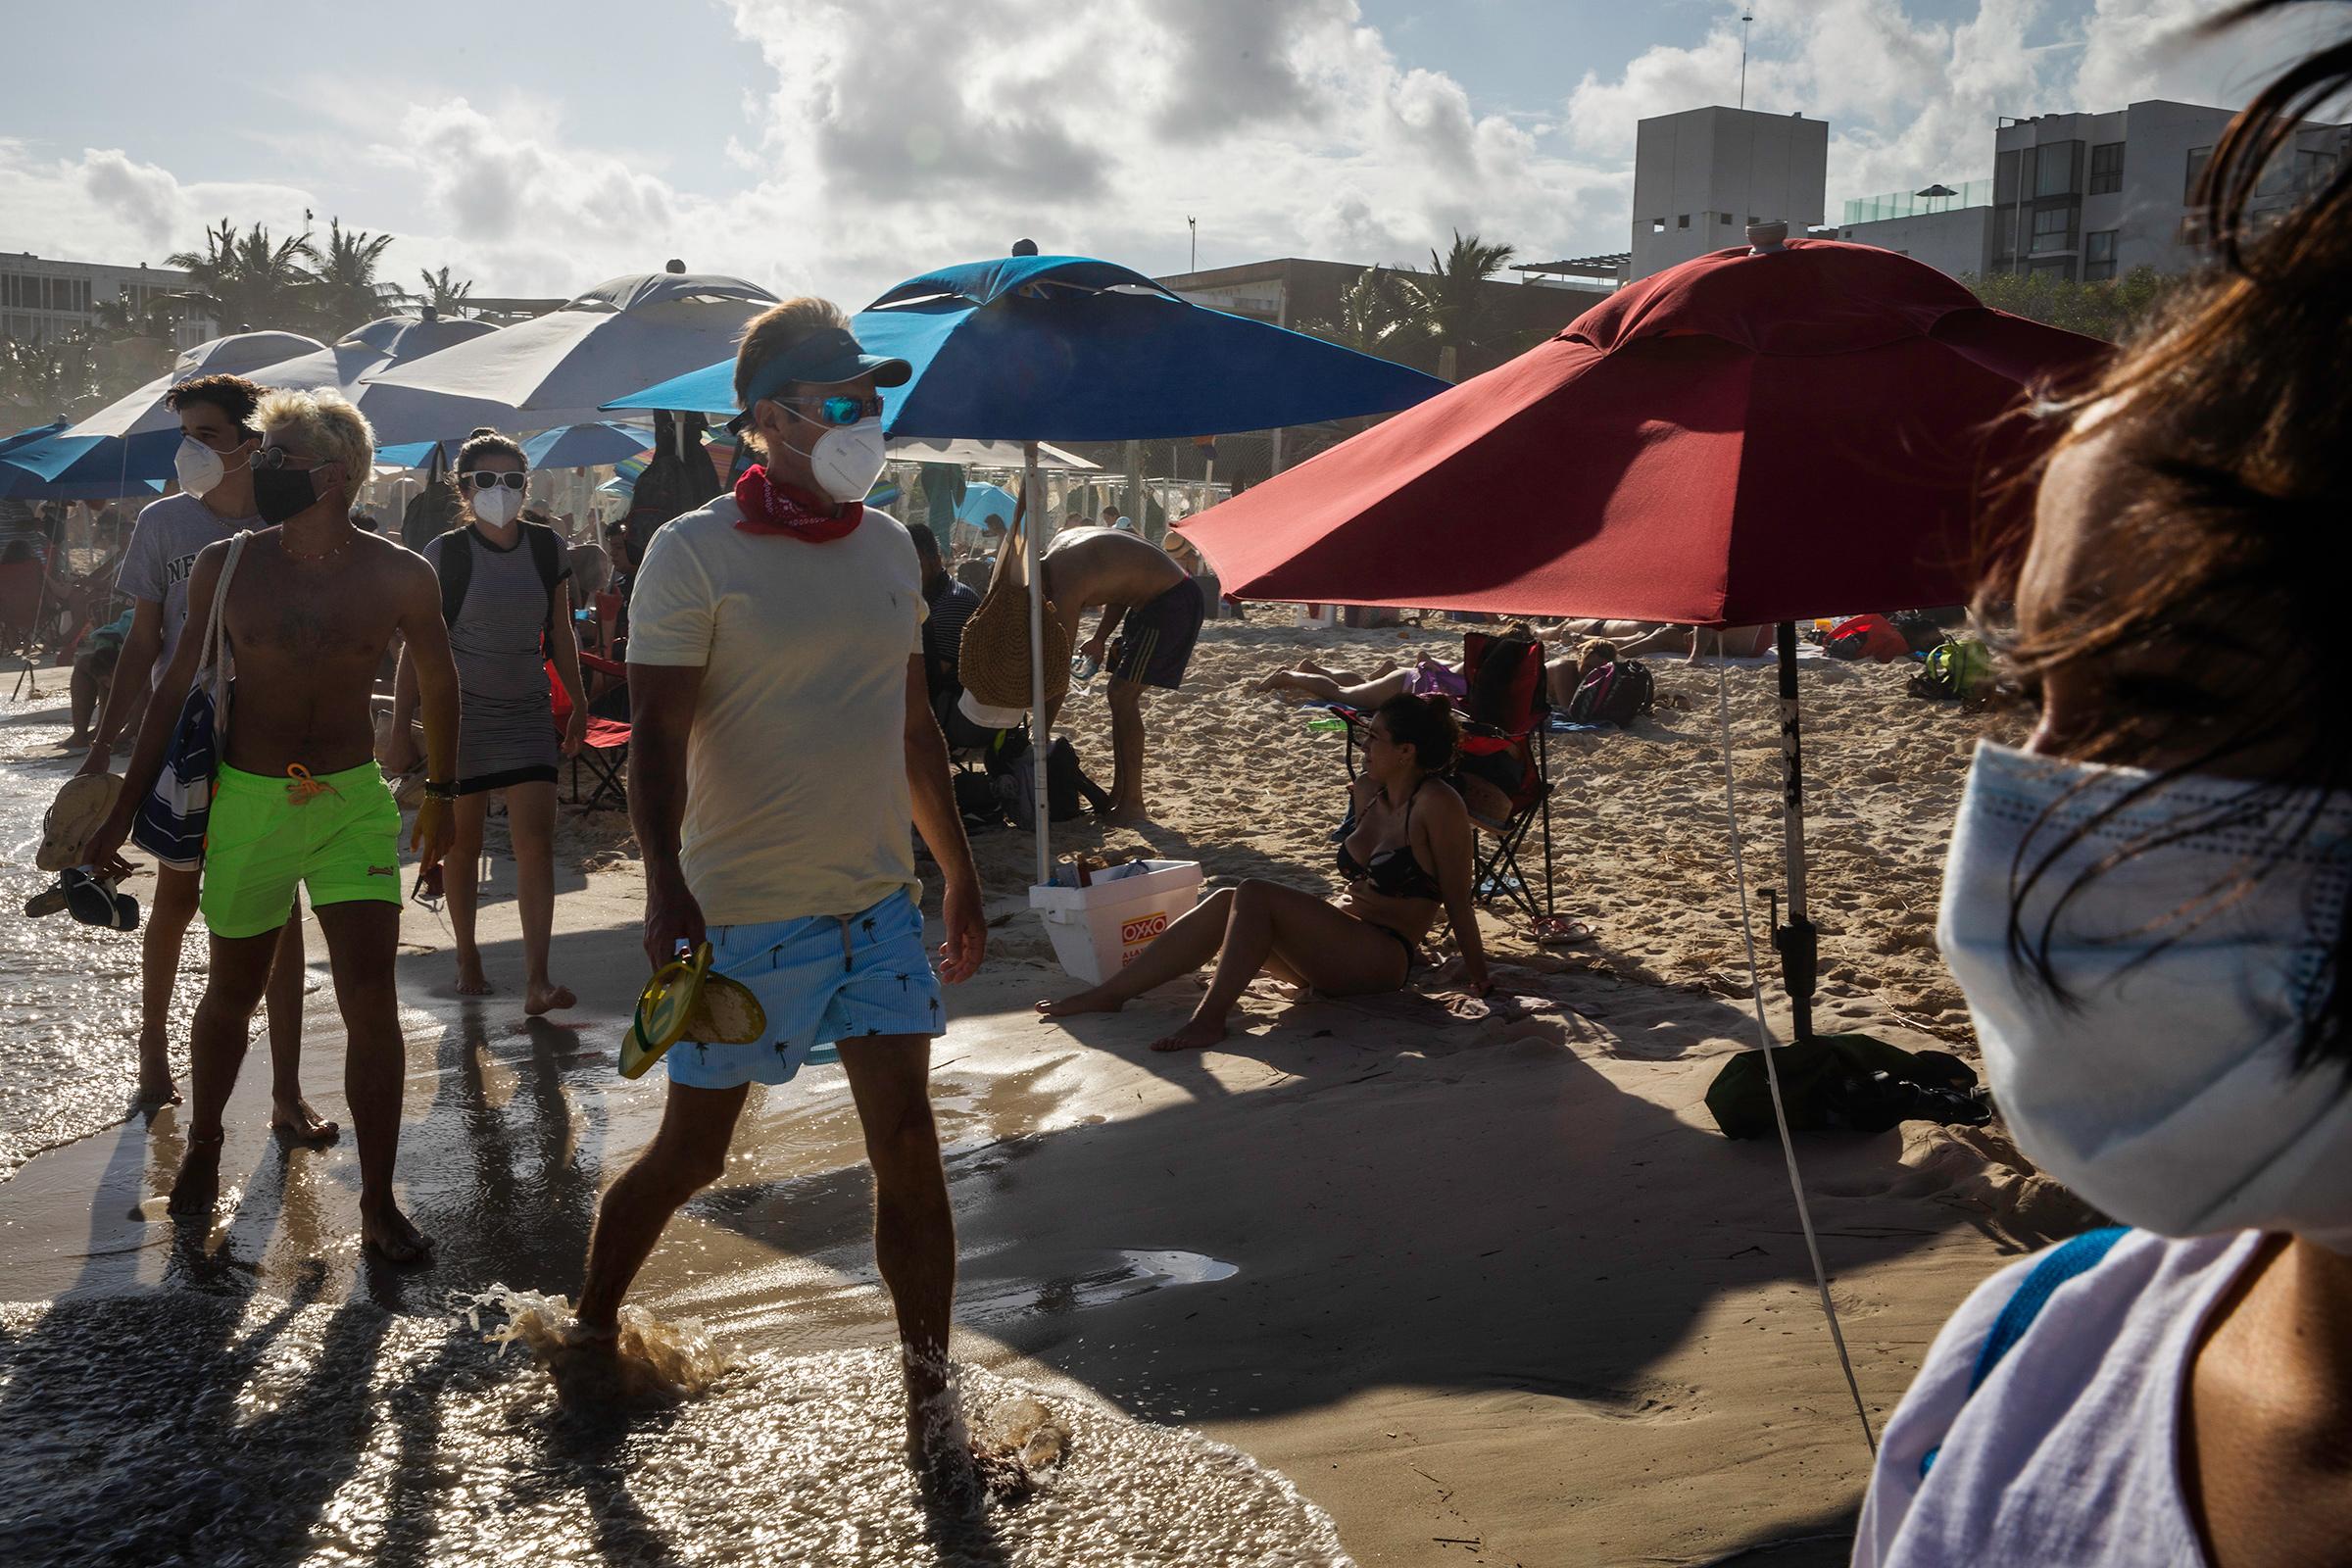 Tourists stroll on the beach in Playa del Carmen, Quintana Roo, Mexico, on Nov. 22, 2020.